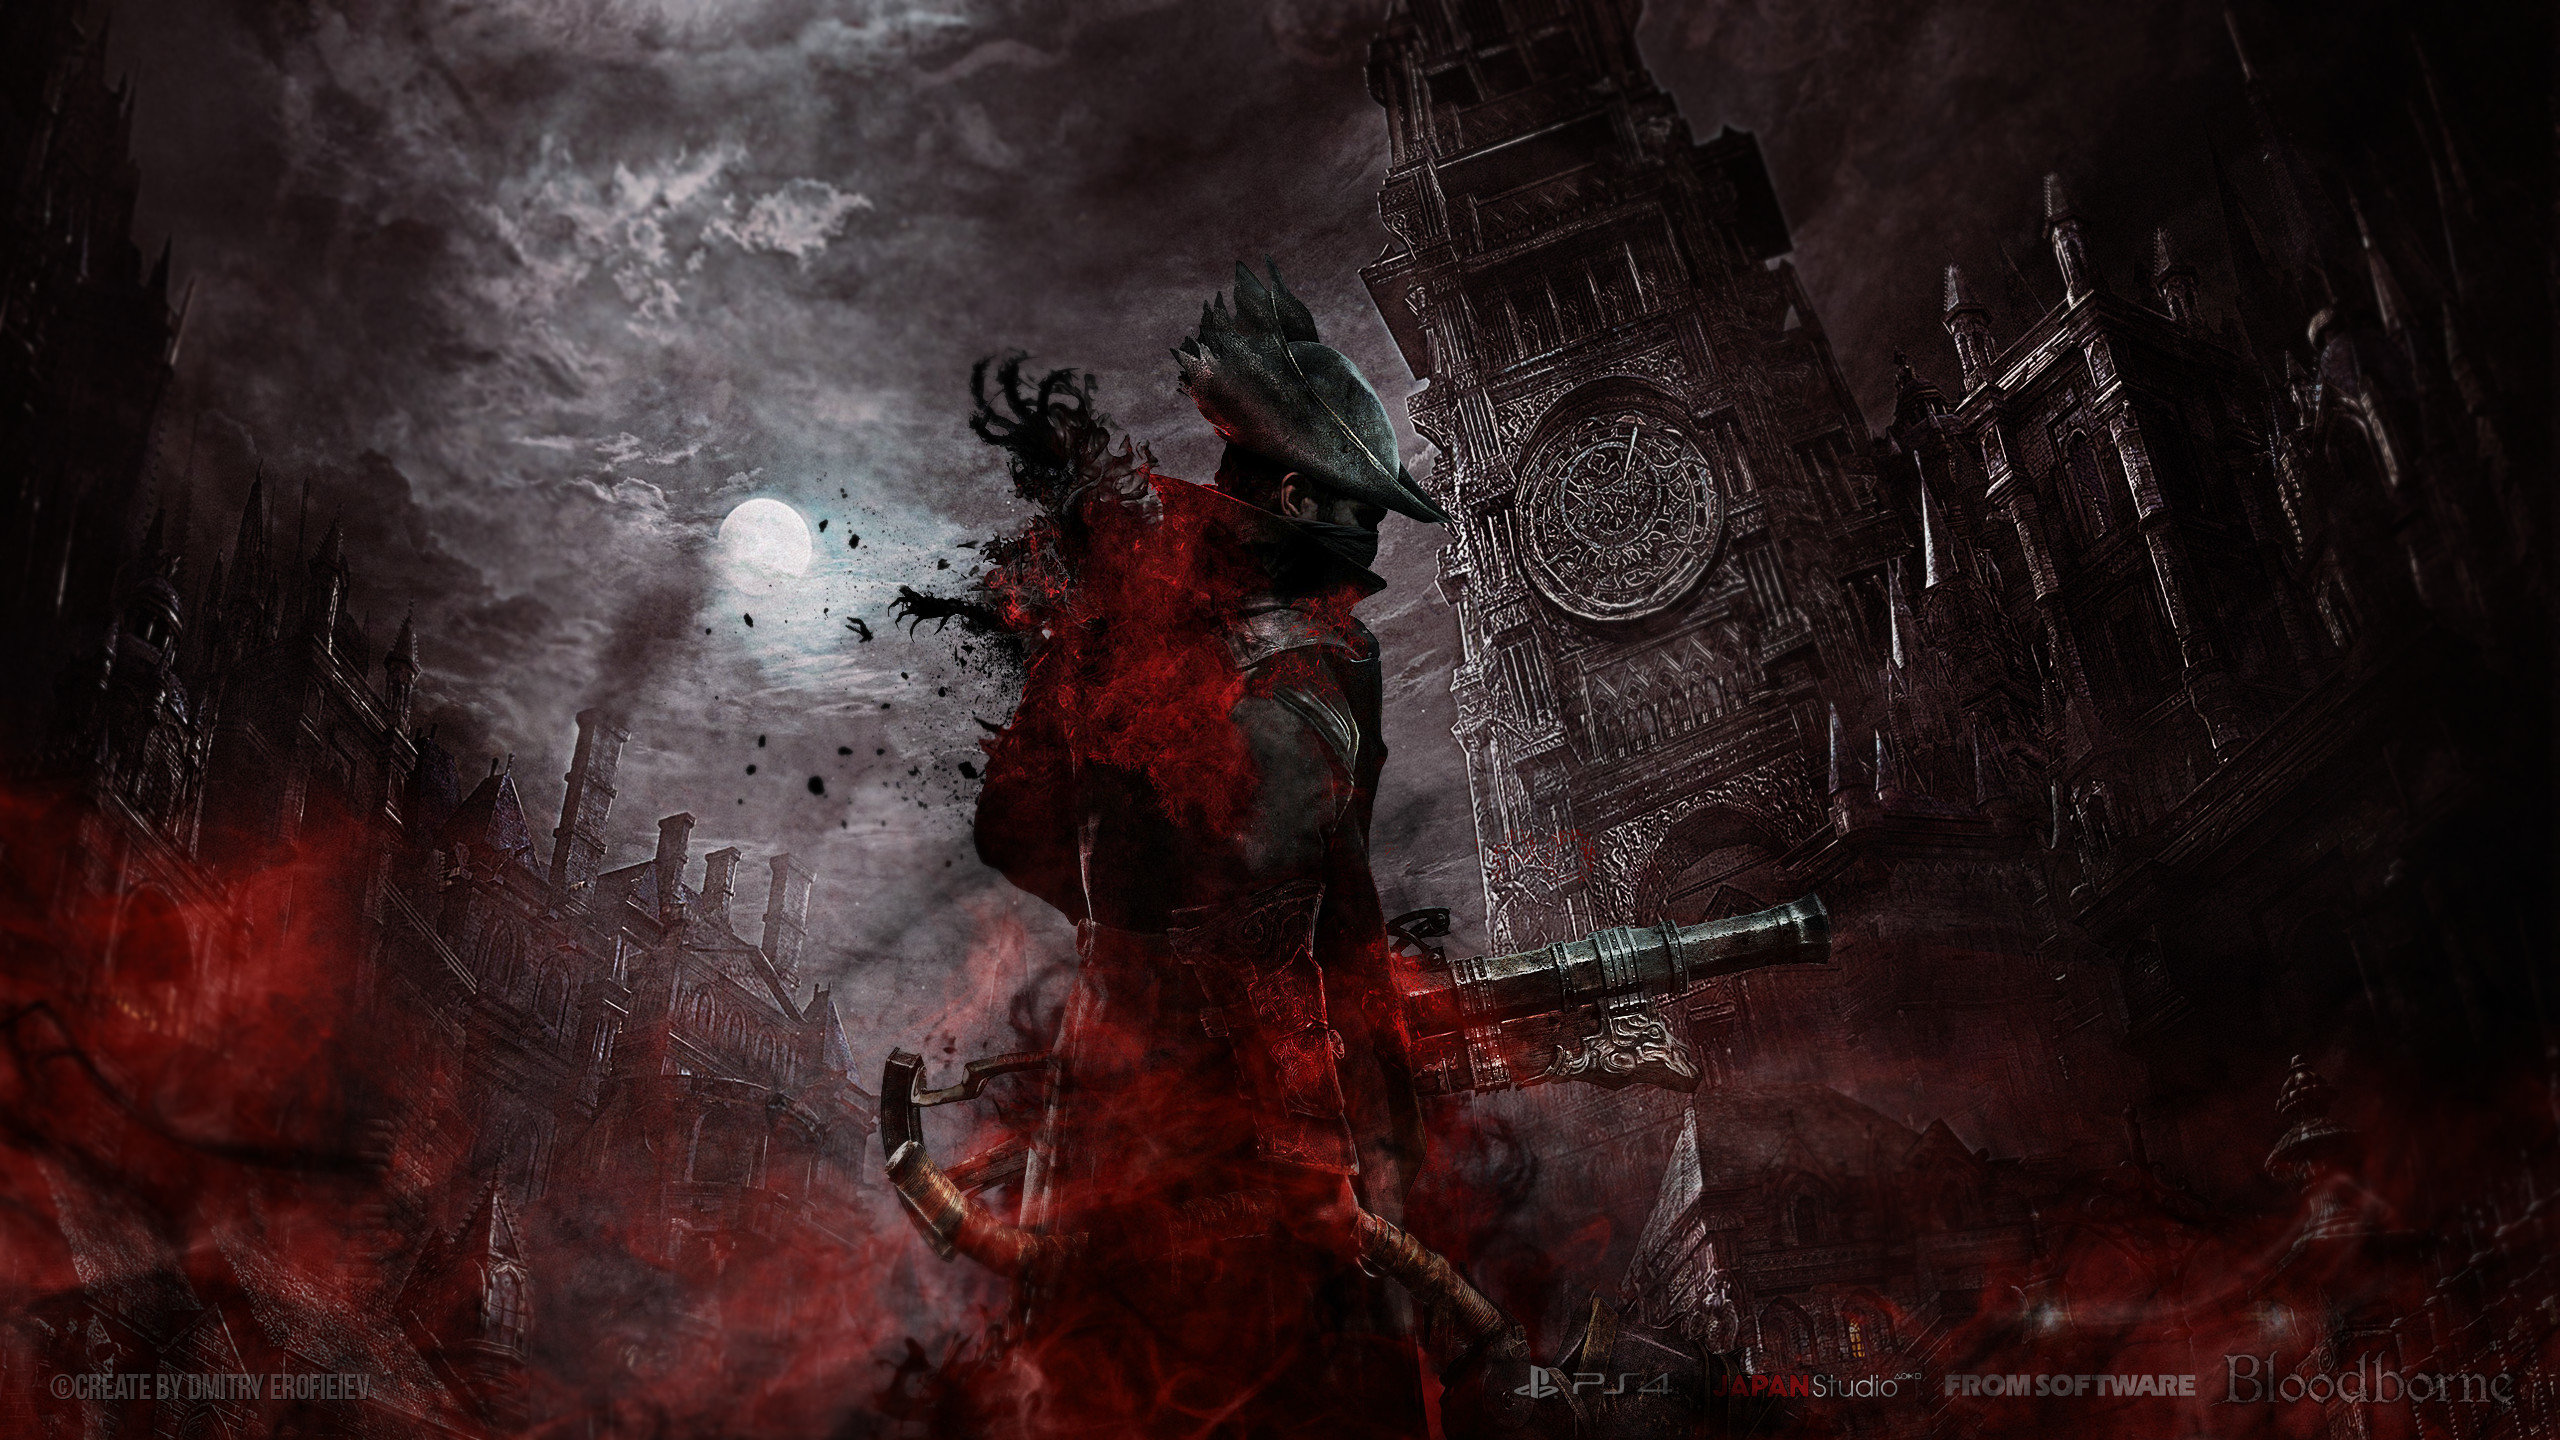 High Resolution Bloodborne Hd 2560x1440 Wallpaper ID61989 For Desktop